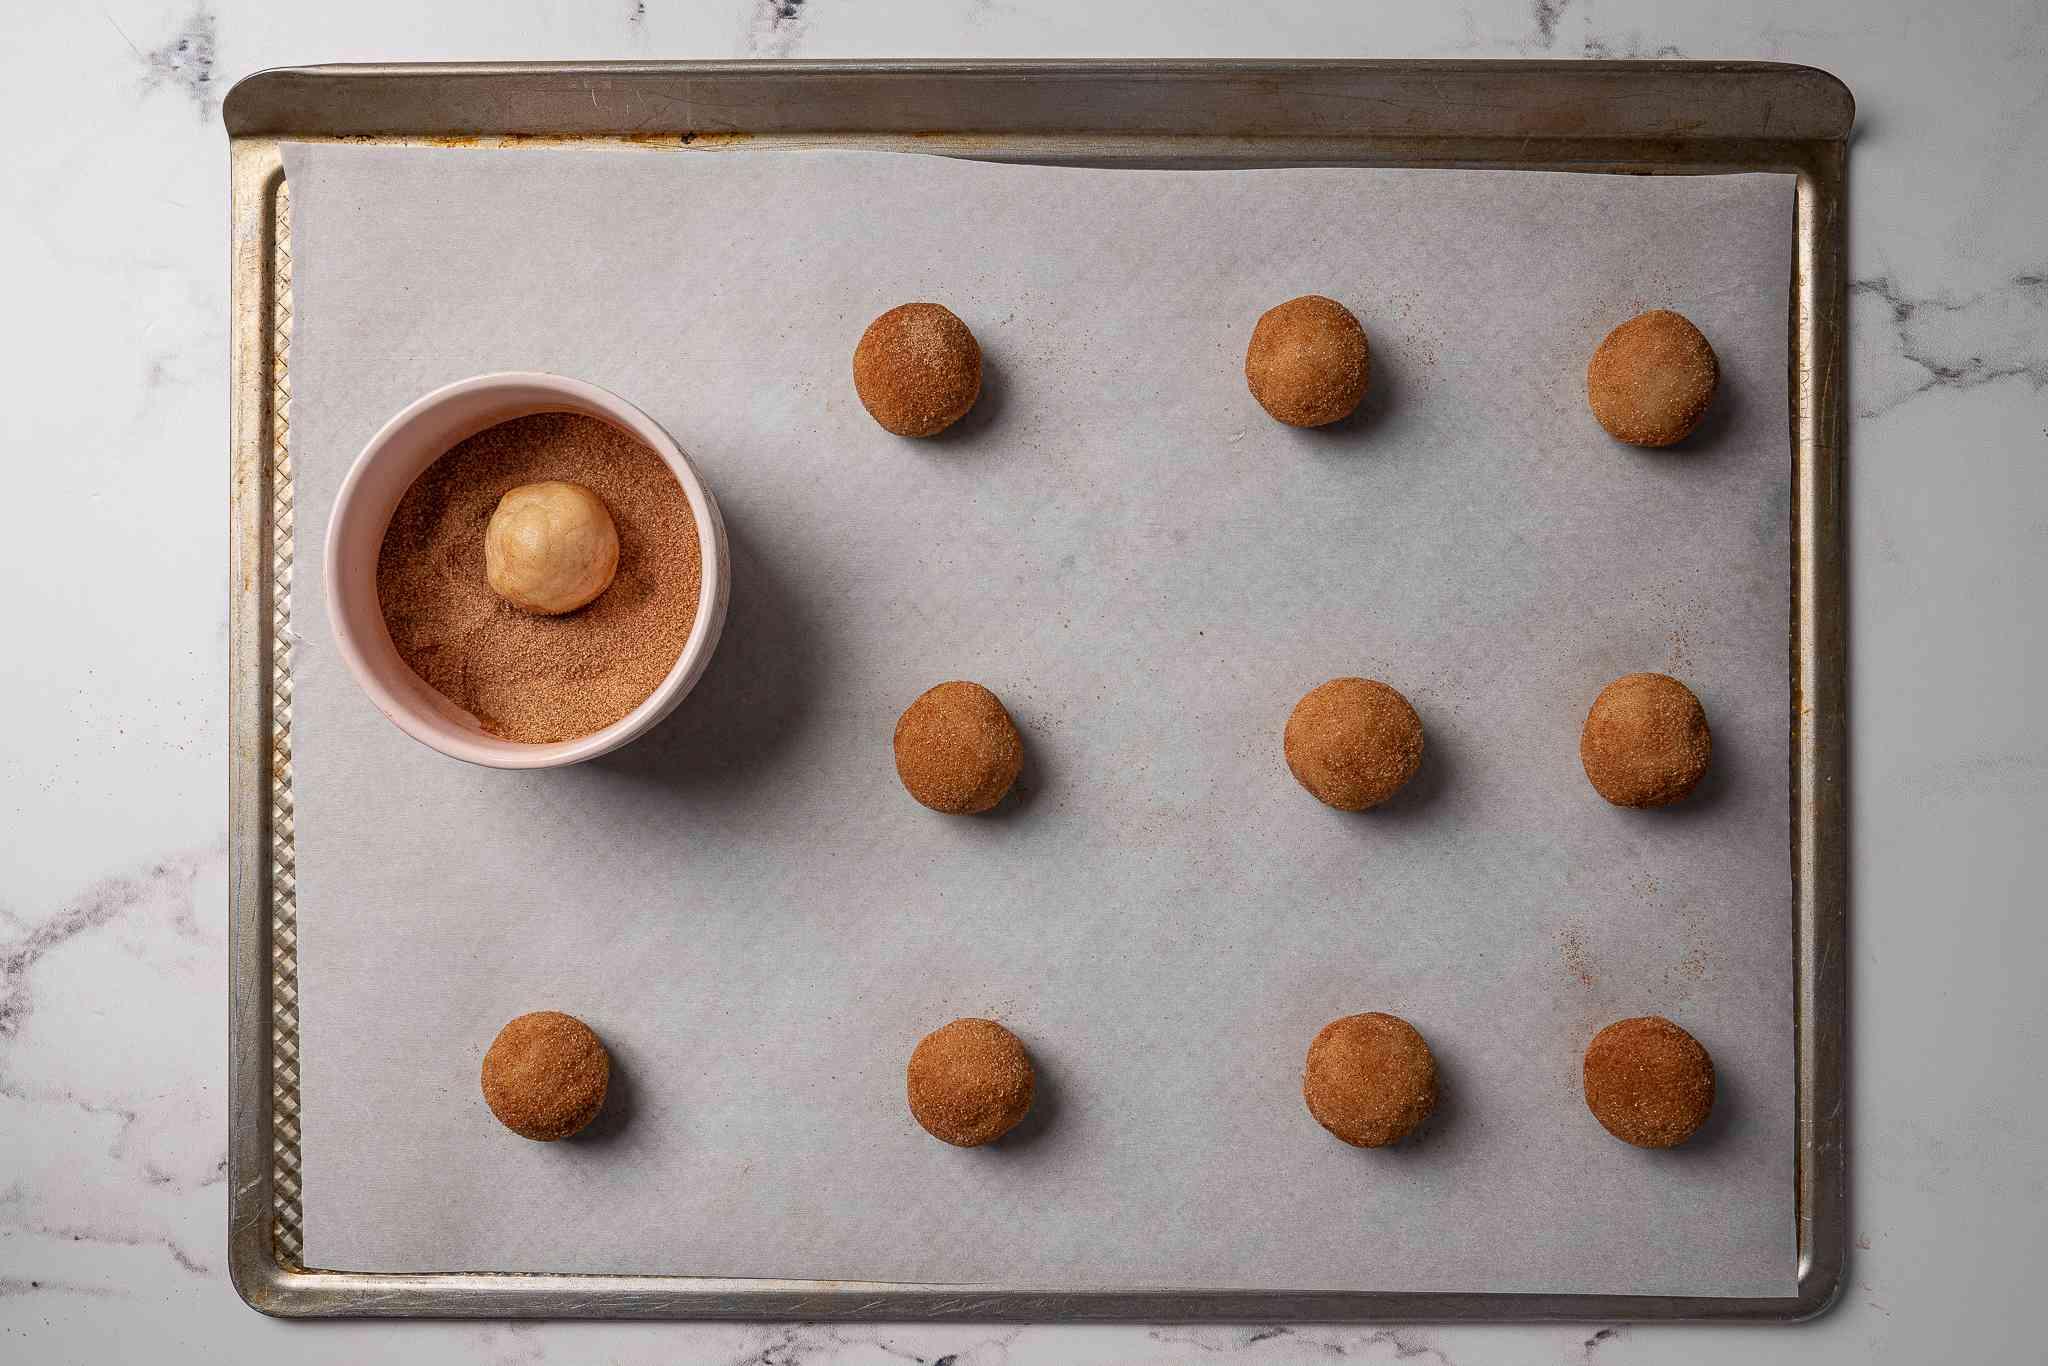 Balls of vegan snickerdoodle dough being rolled in cinnamon sugar